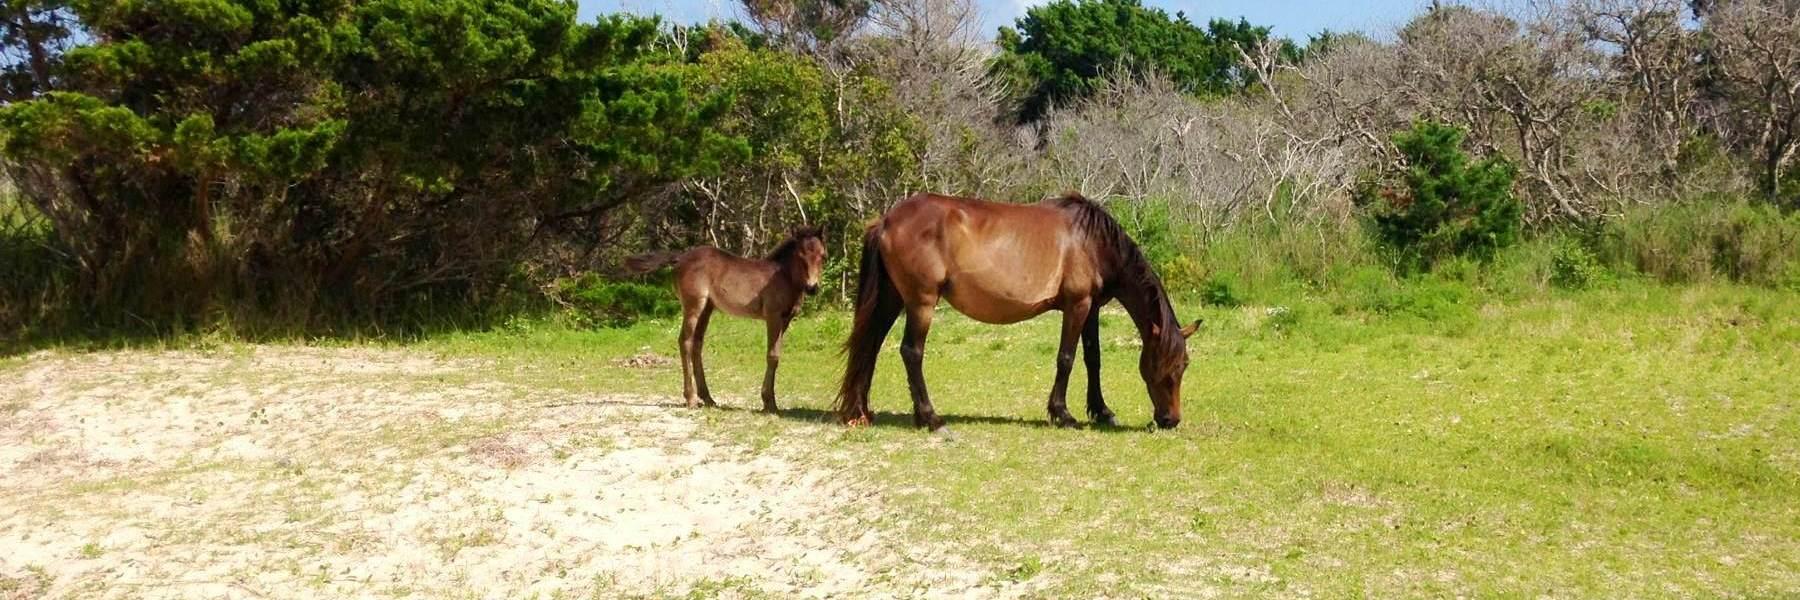 Shackleford Bank horses - courtesy National Park Service